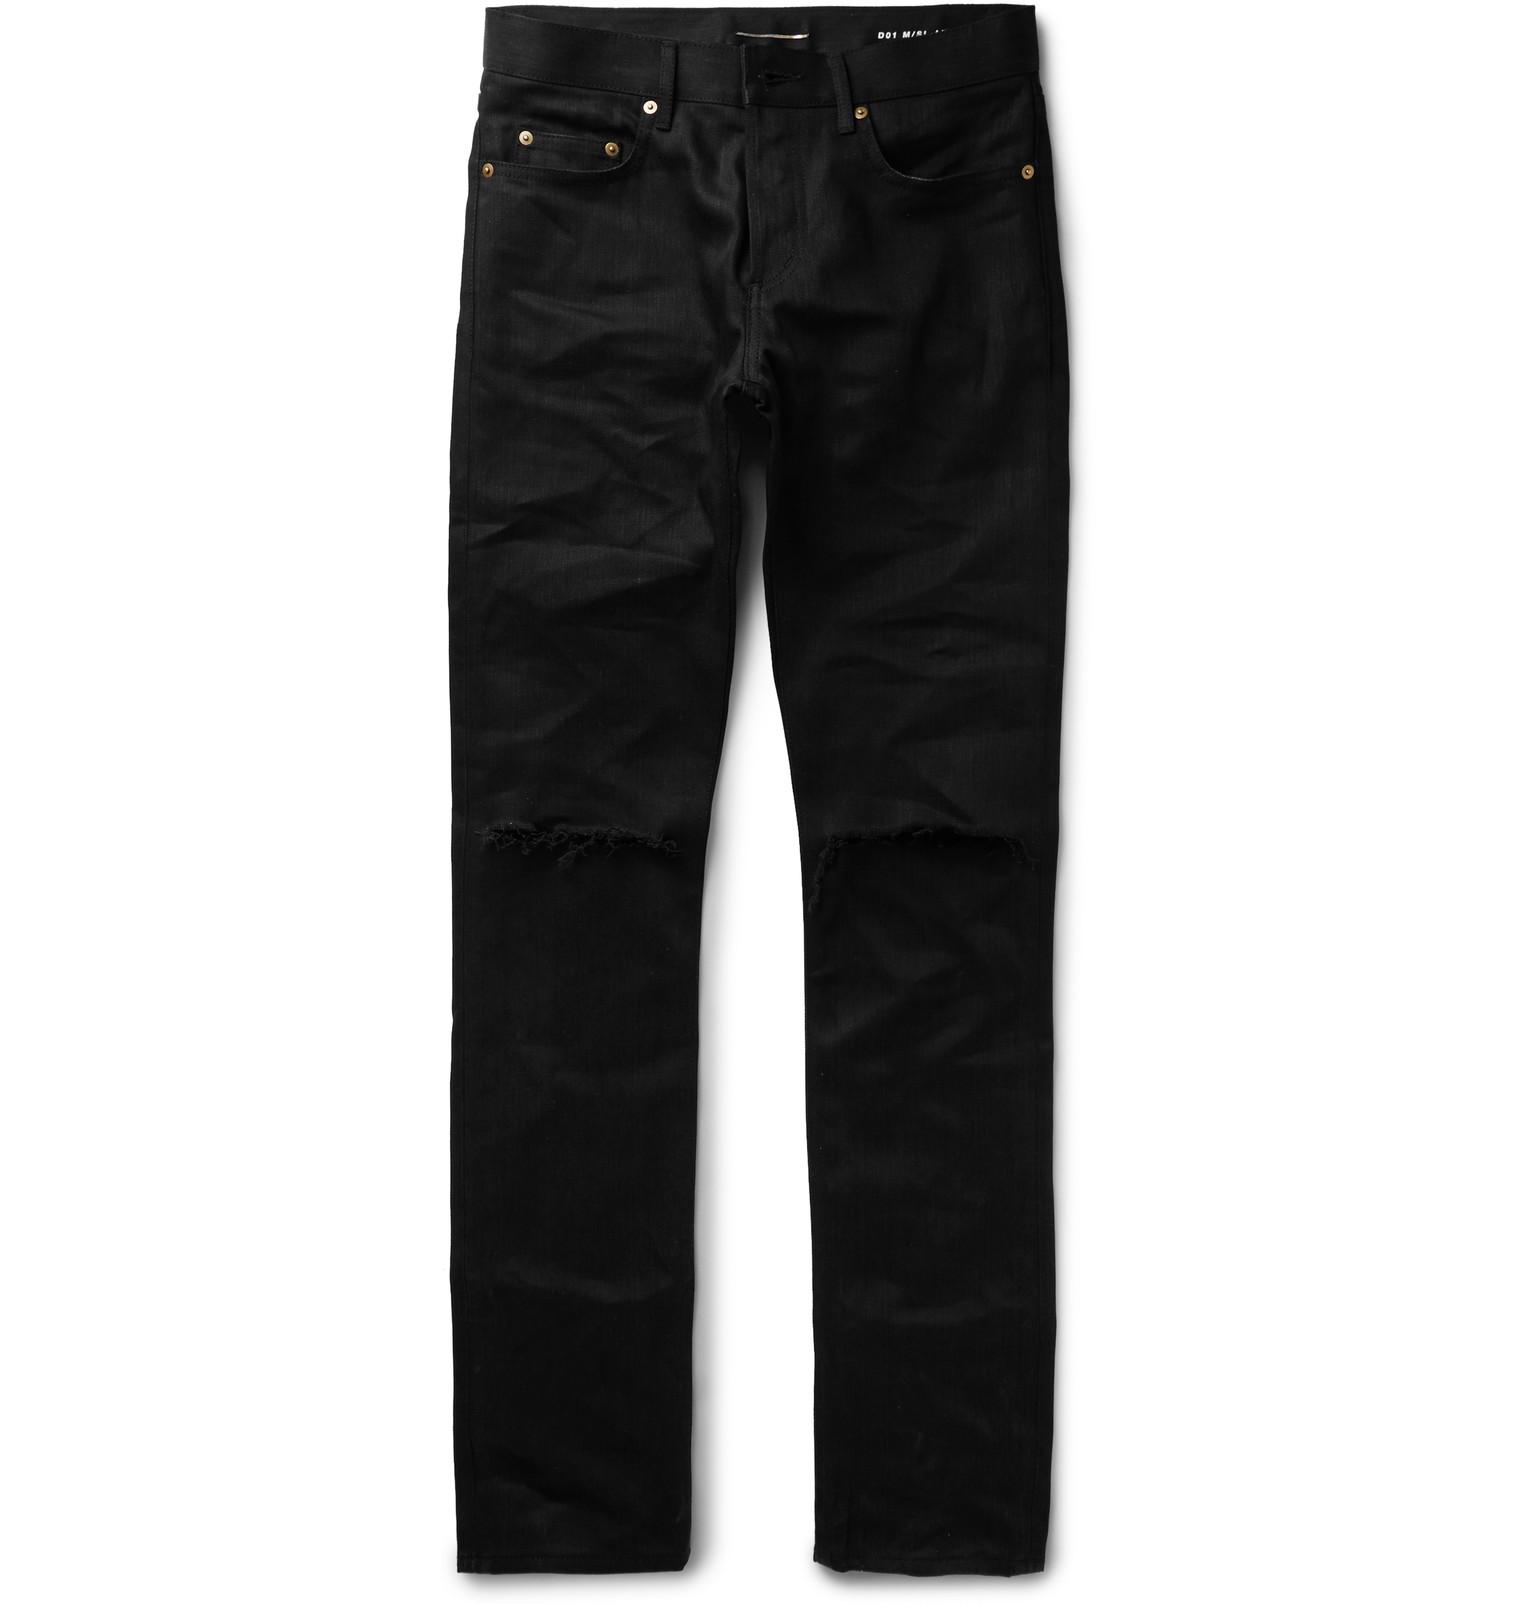 Saint Laurent Jeans Mrp In Xxl